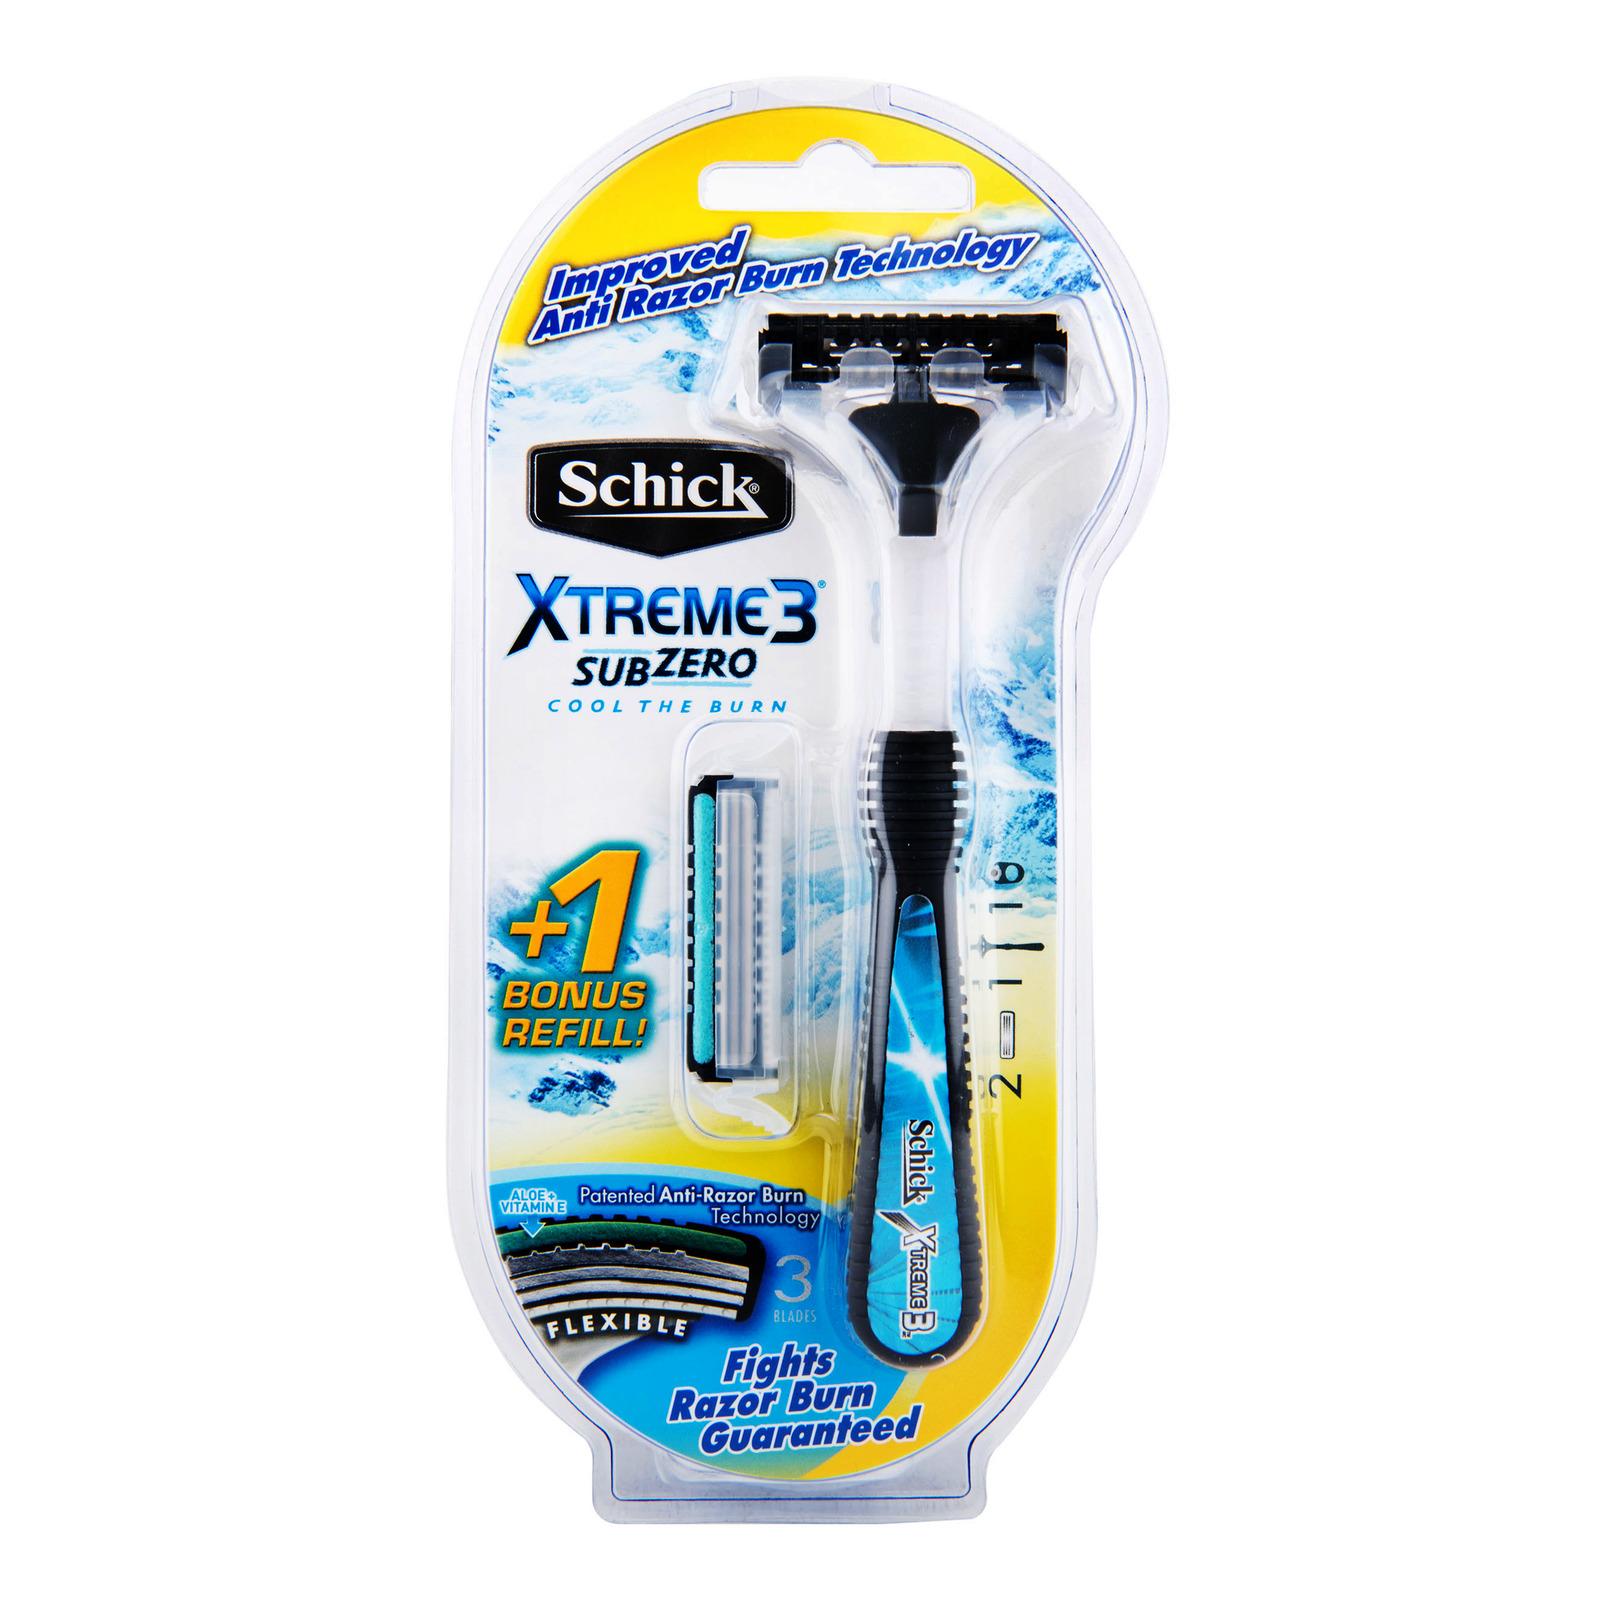 Schick Razor with Cartridge Refill - Xtreme 3